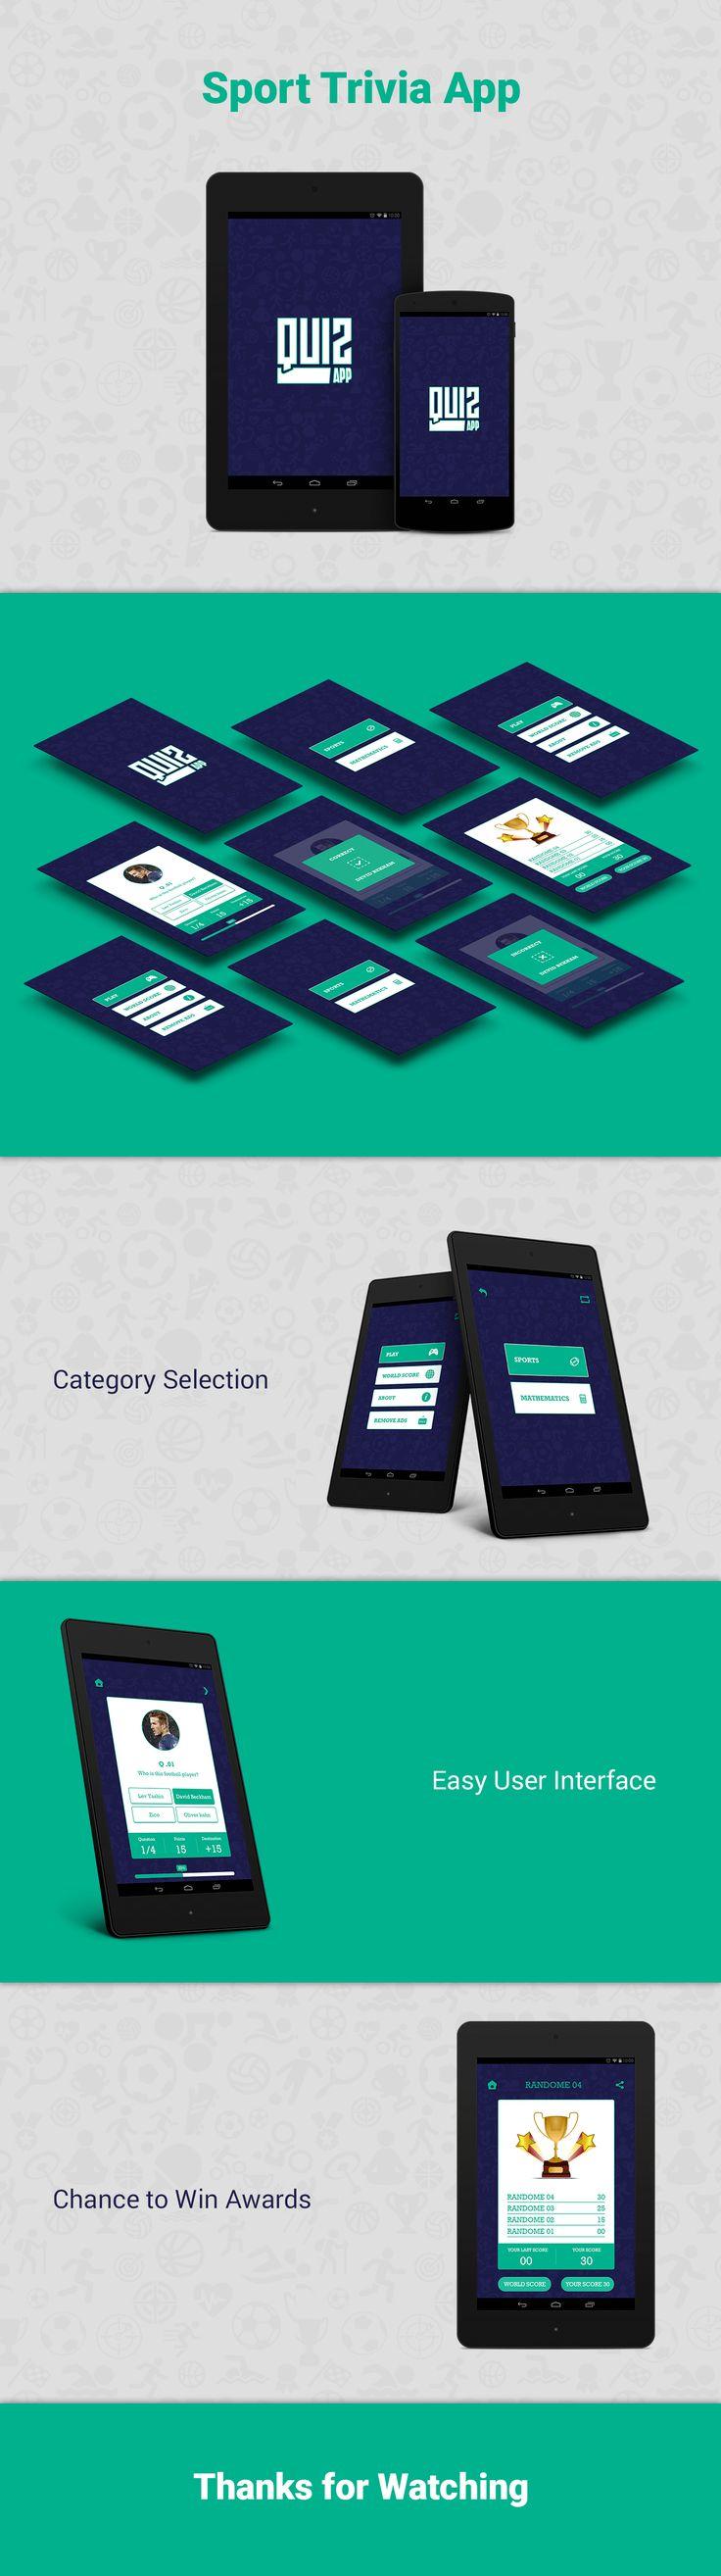 Sports Trivia - Quiz App UI Design on Behance